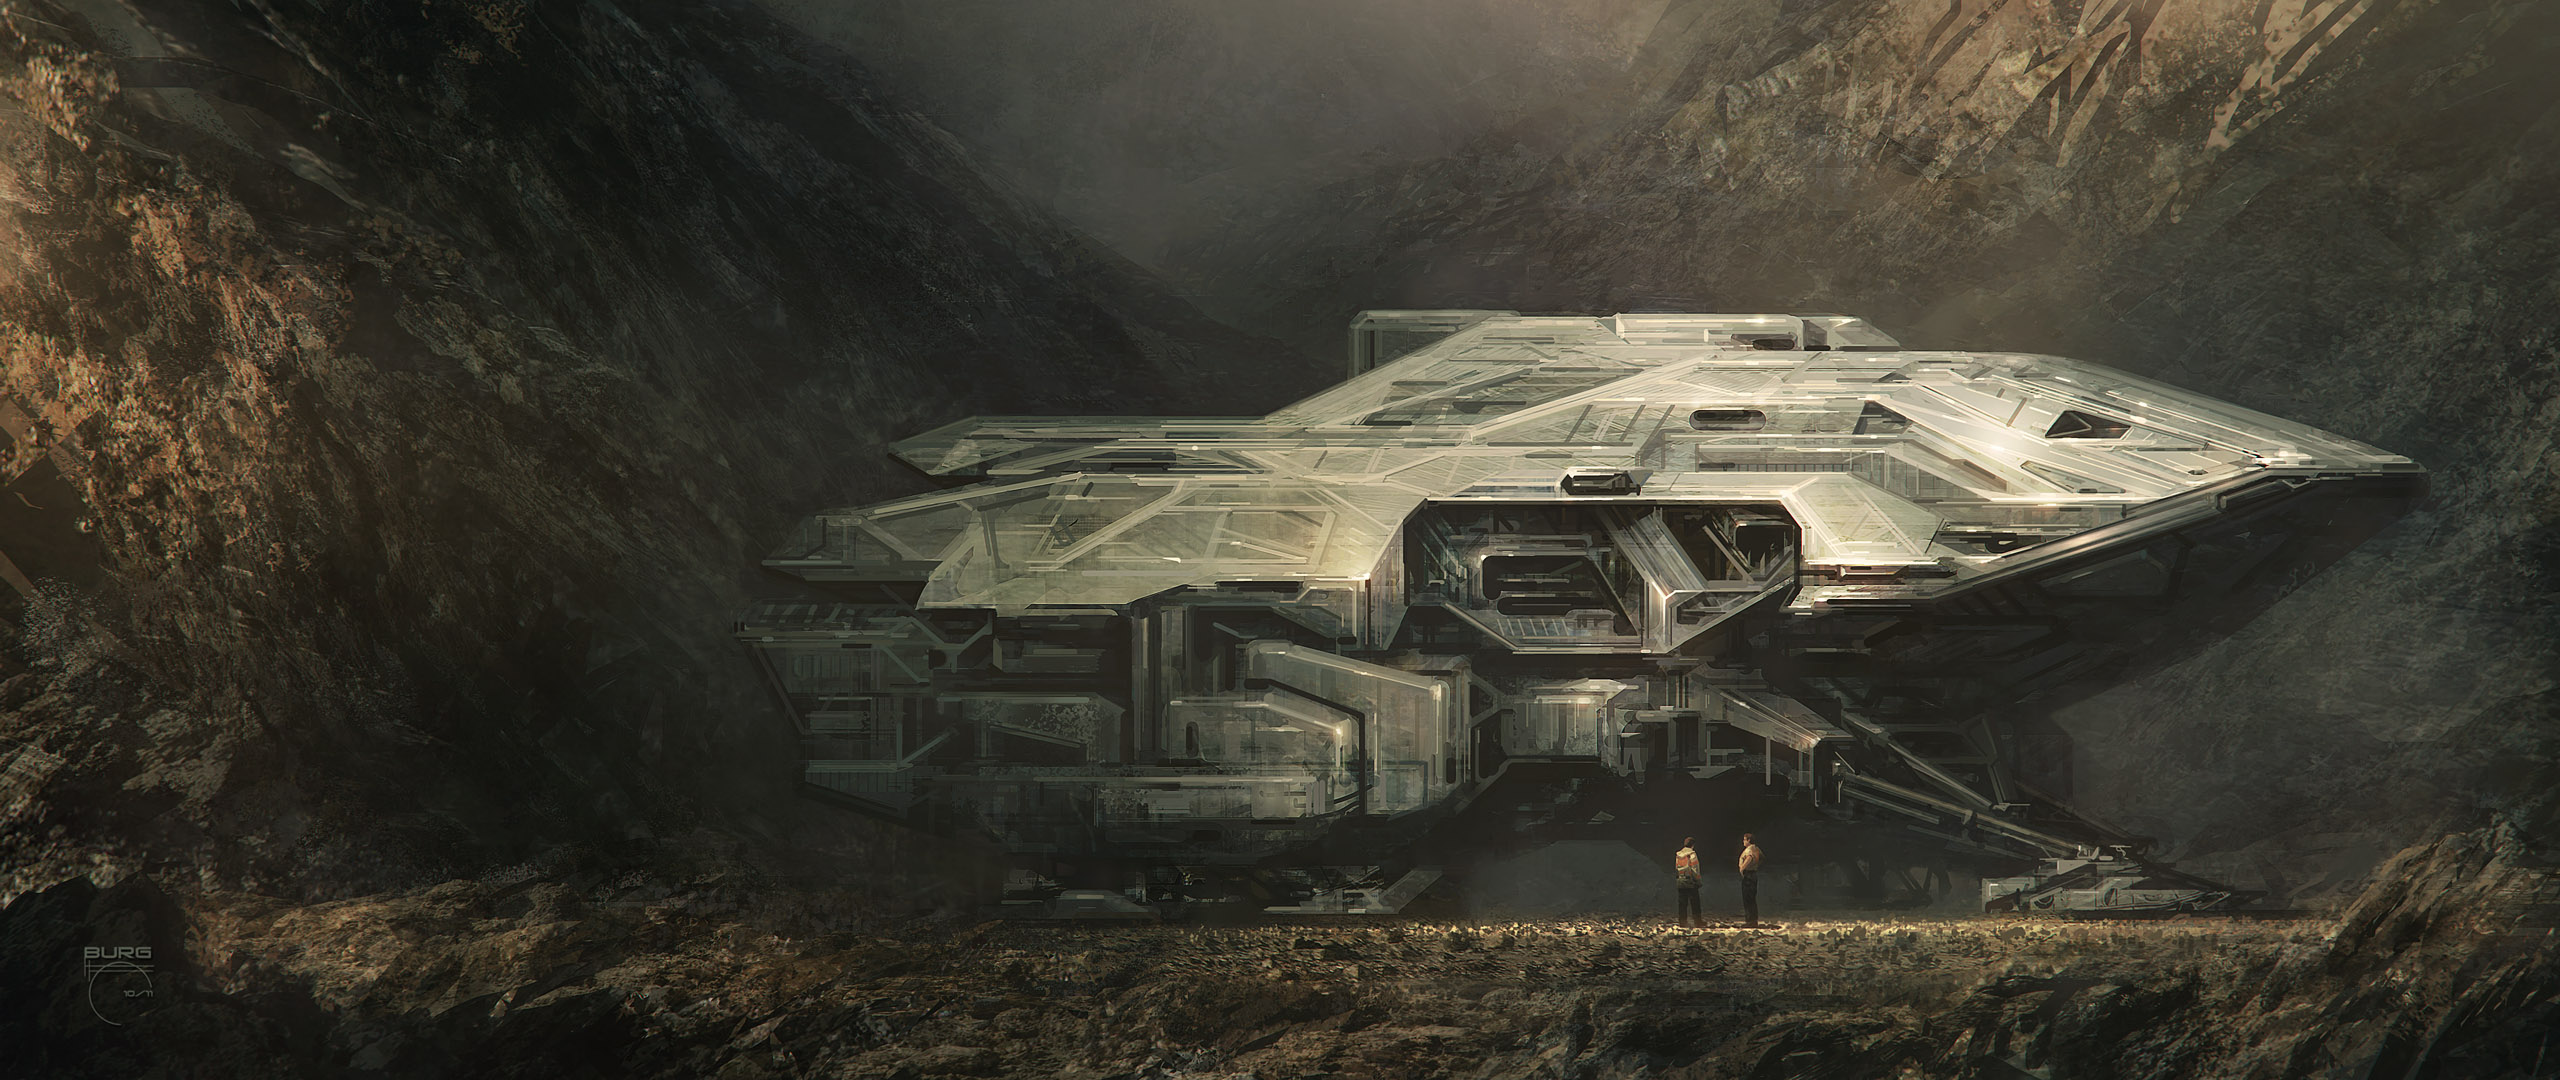 Spaceship hd wallpaper background image 2560x1080 id - Spaceship wallpaper ...